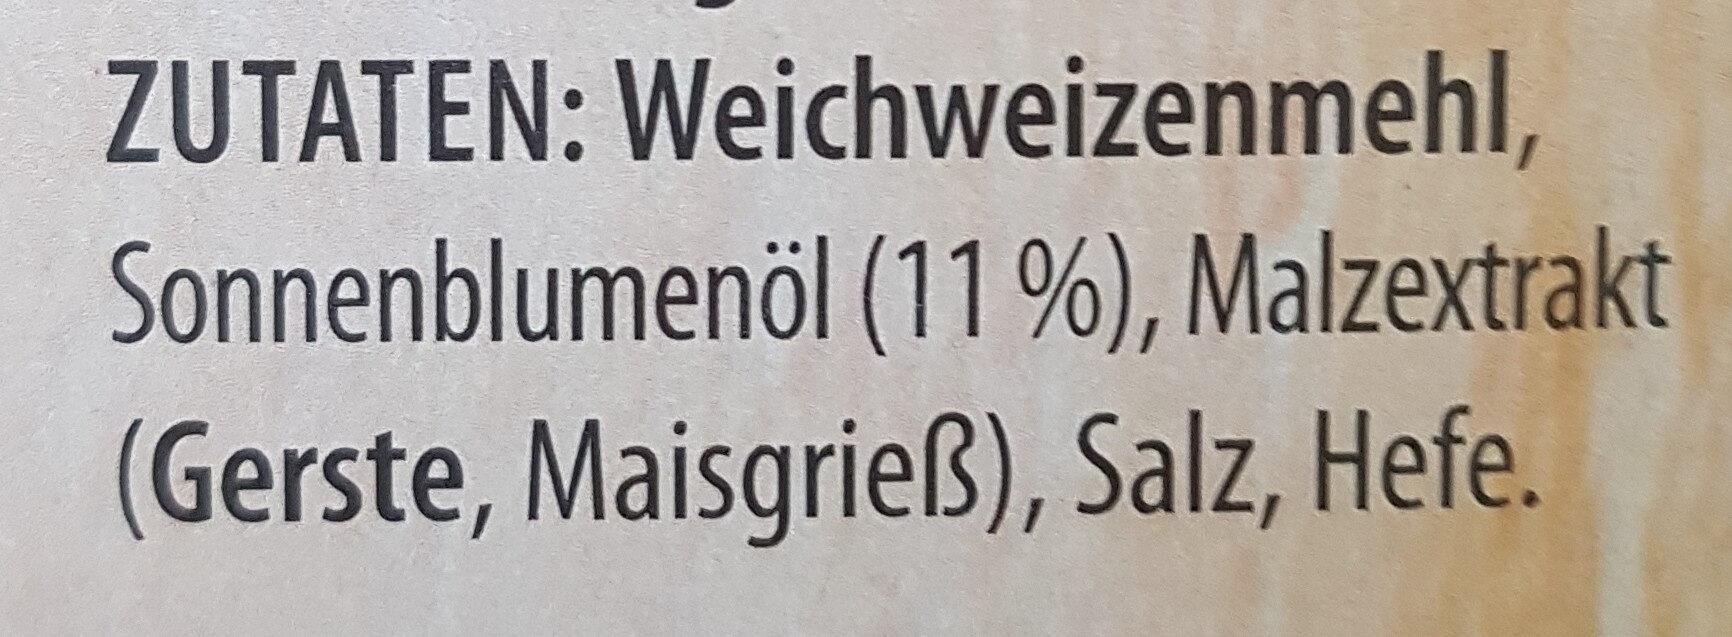 Crissini Torinesi - Ingredients